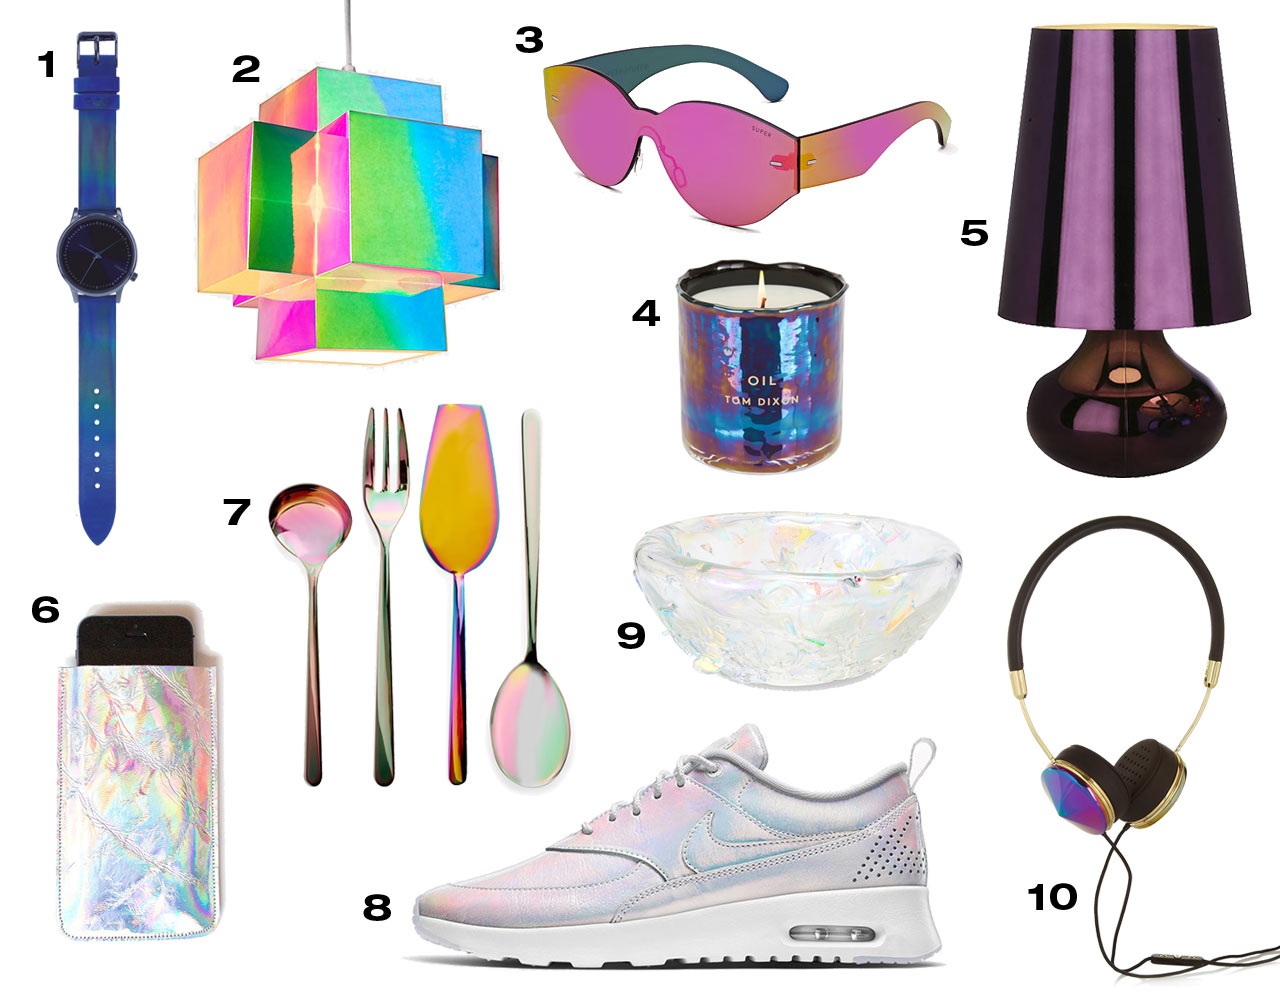 Ooh Shiny 10 Modern Iridescent Designs Design Milk